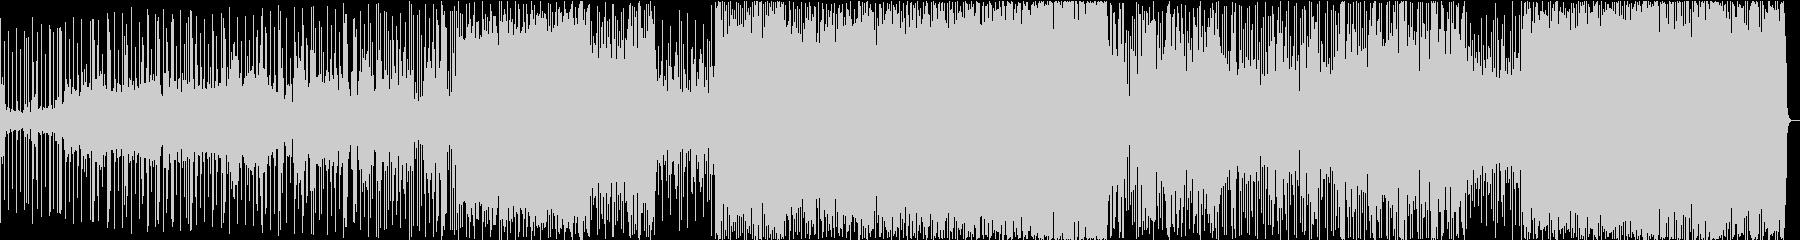 Triooo - VOLの未再生の波形